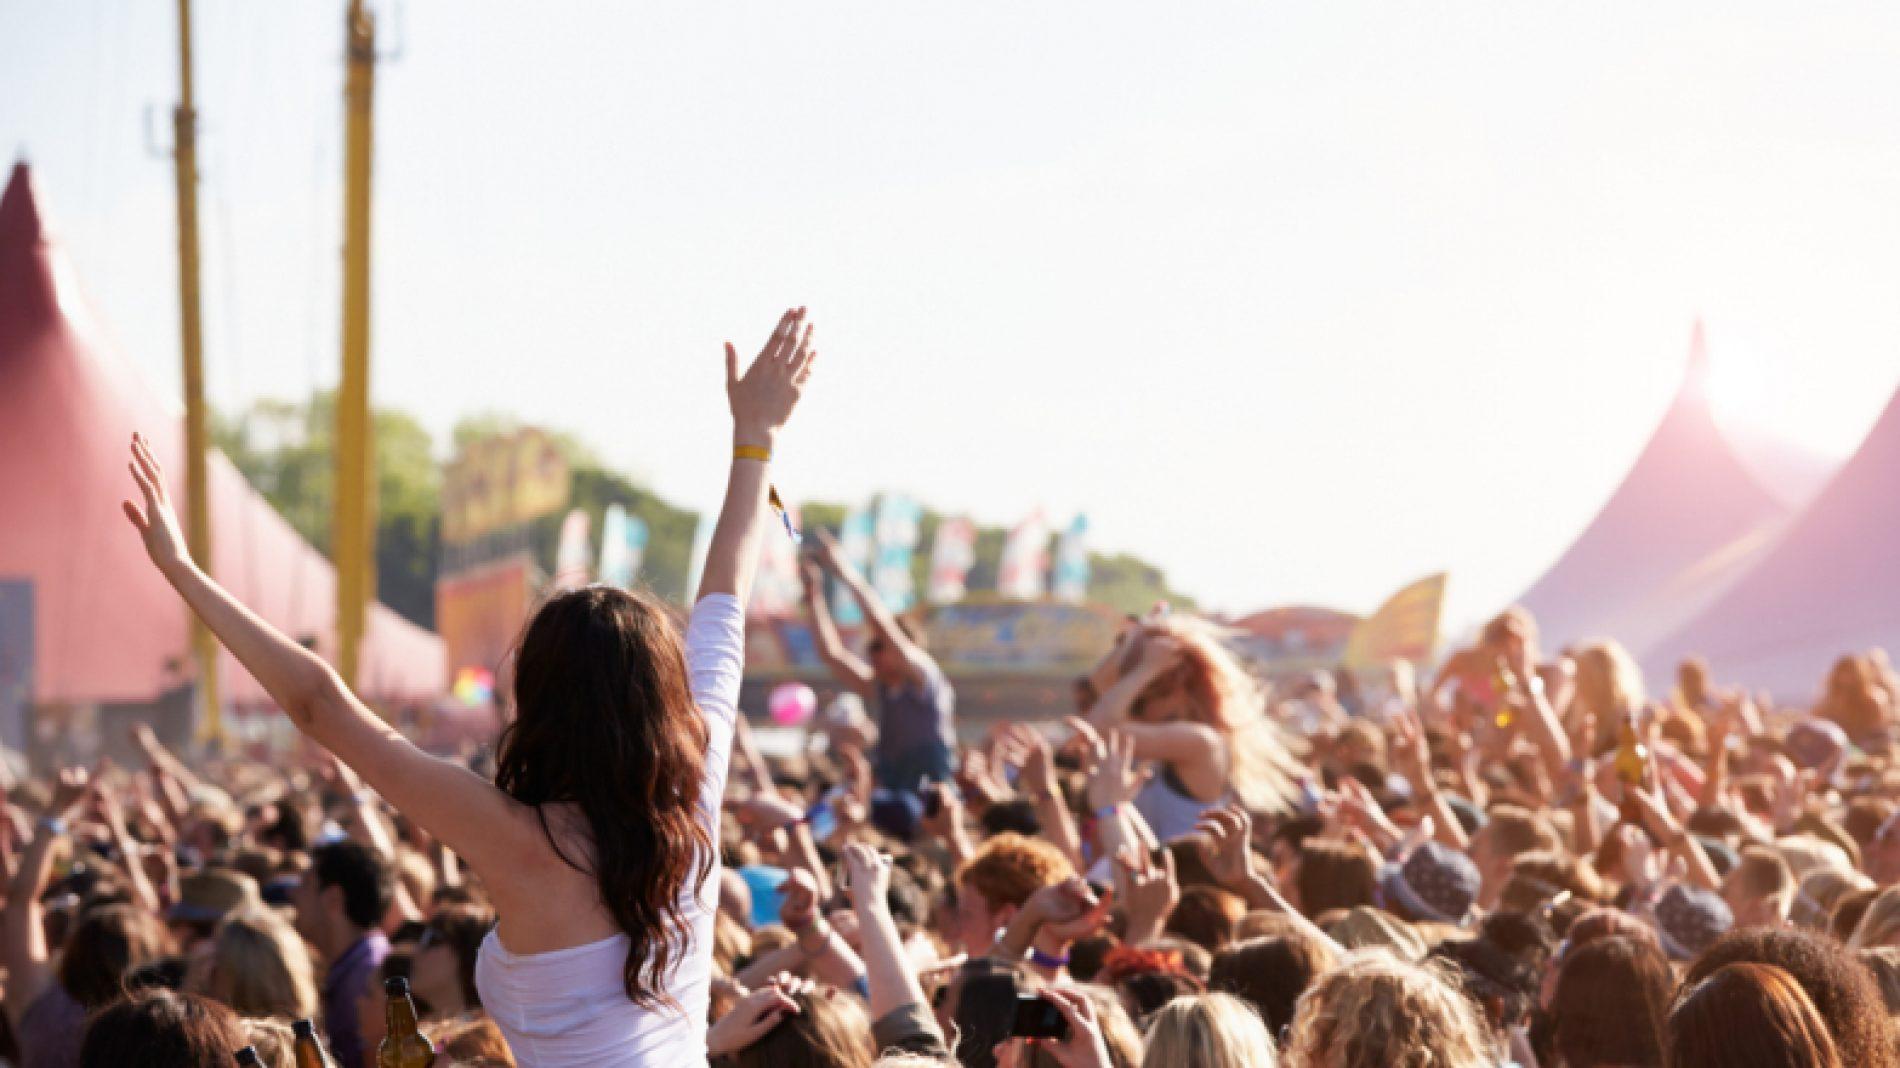 festival4-iW9IiM